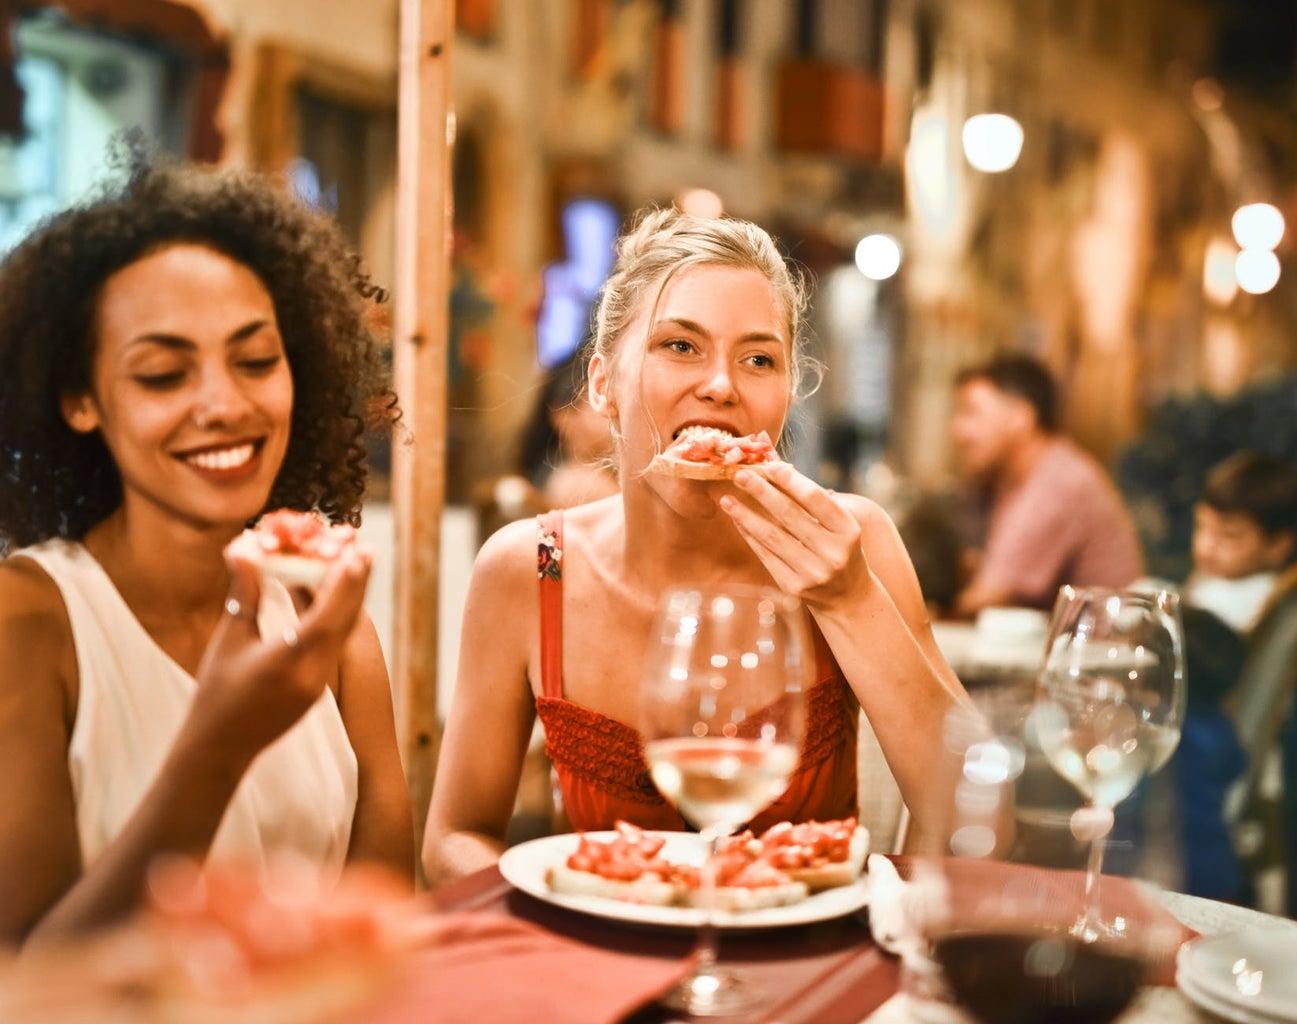 Women eating bruschetta together